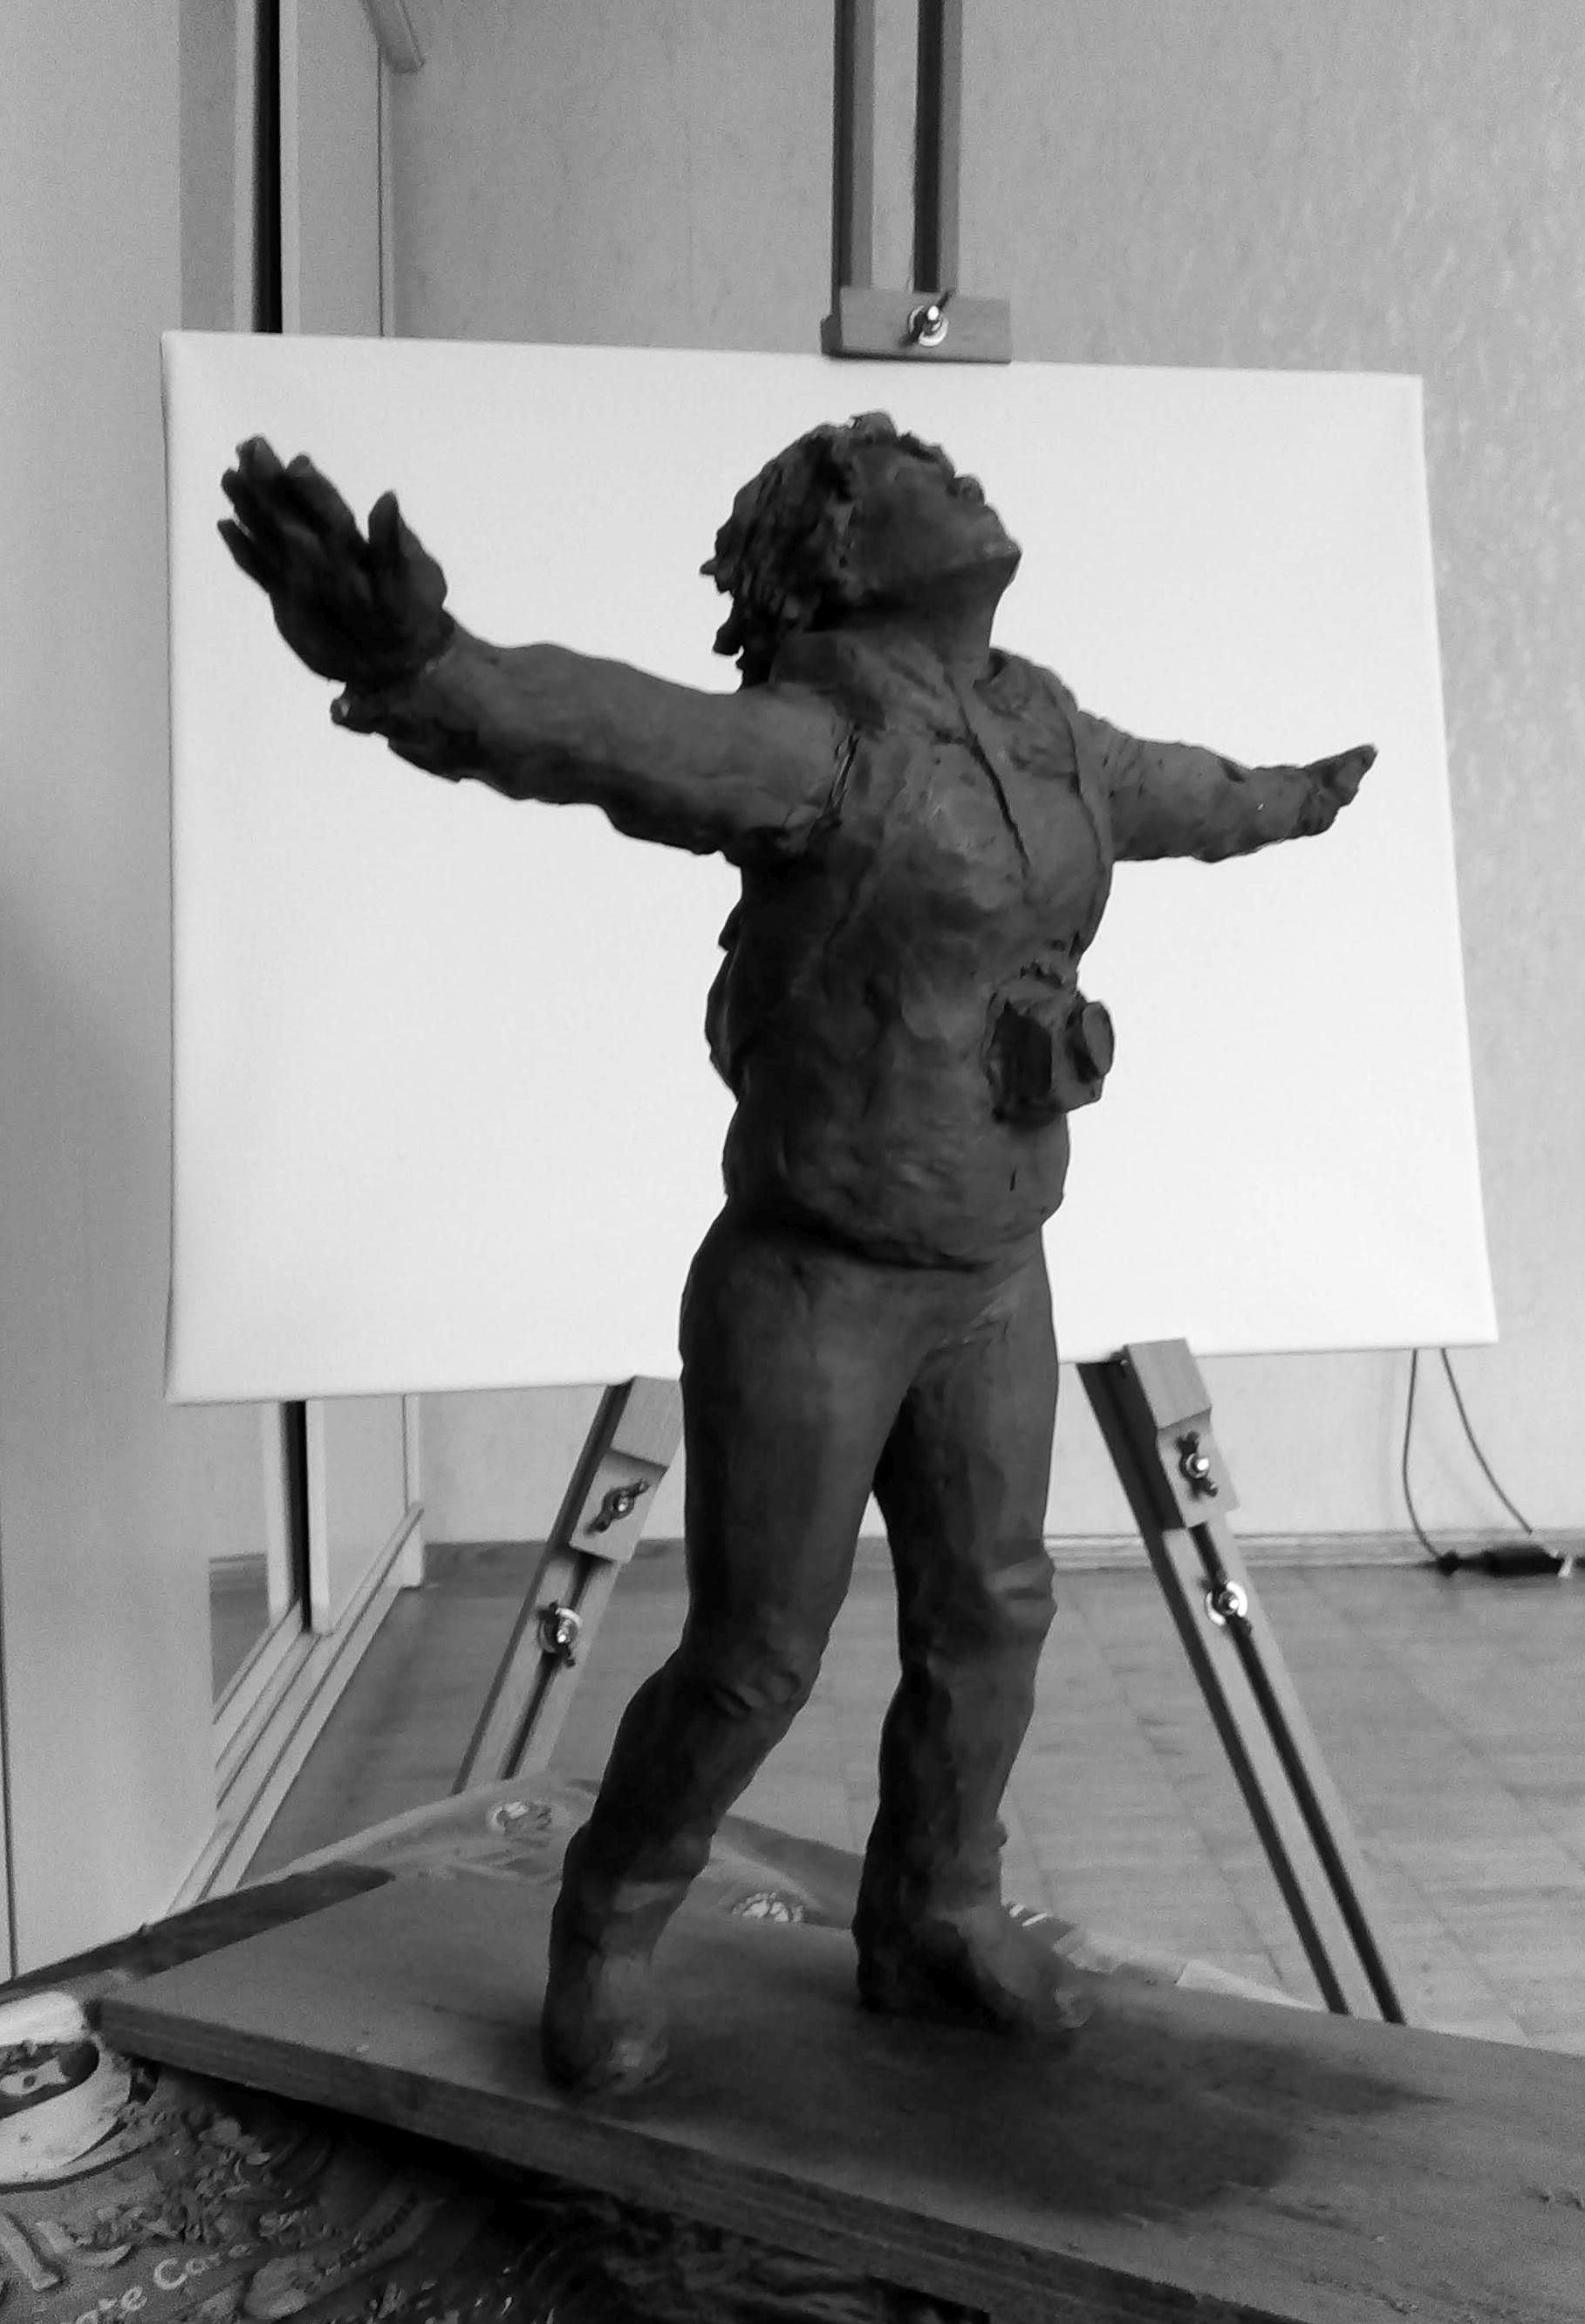 Эскиз памятника Ирине Славиной. Глина, 25 см. © Виктор Корб, 2021. Вид в три четверти, спереди, снизу.